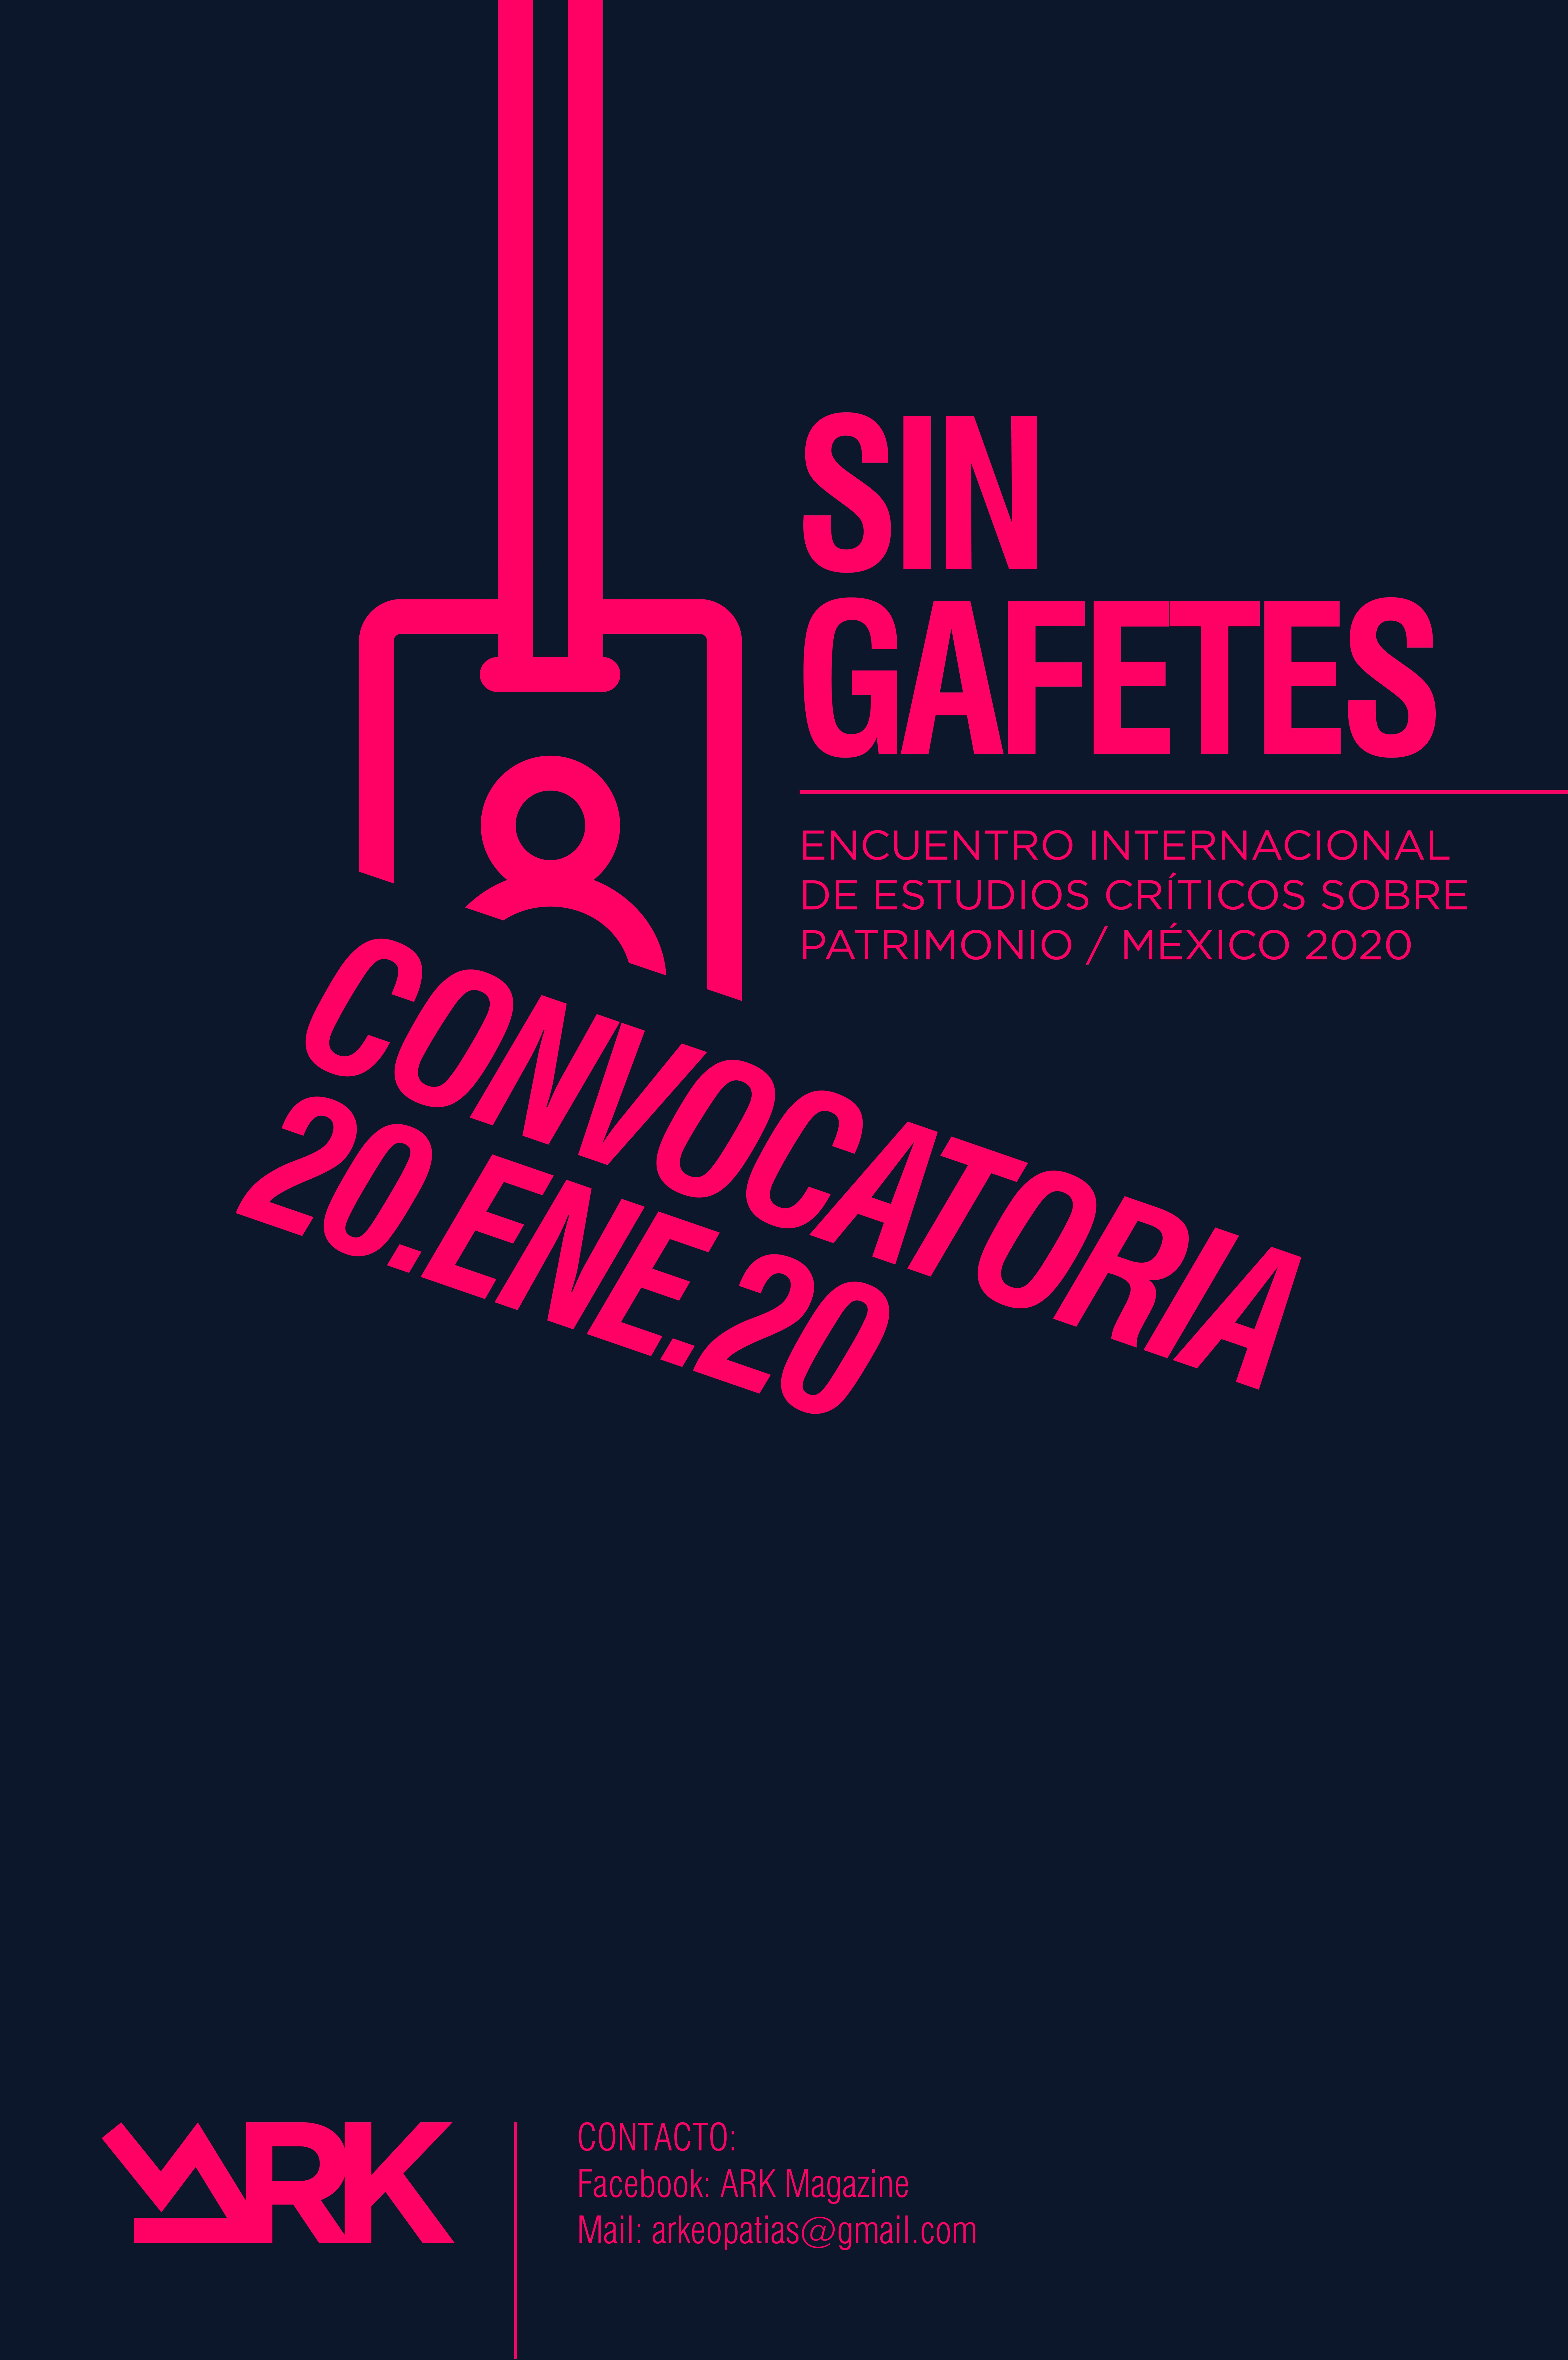 SIN GAFETES VFc-03